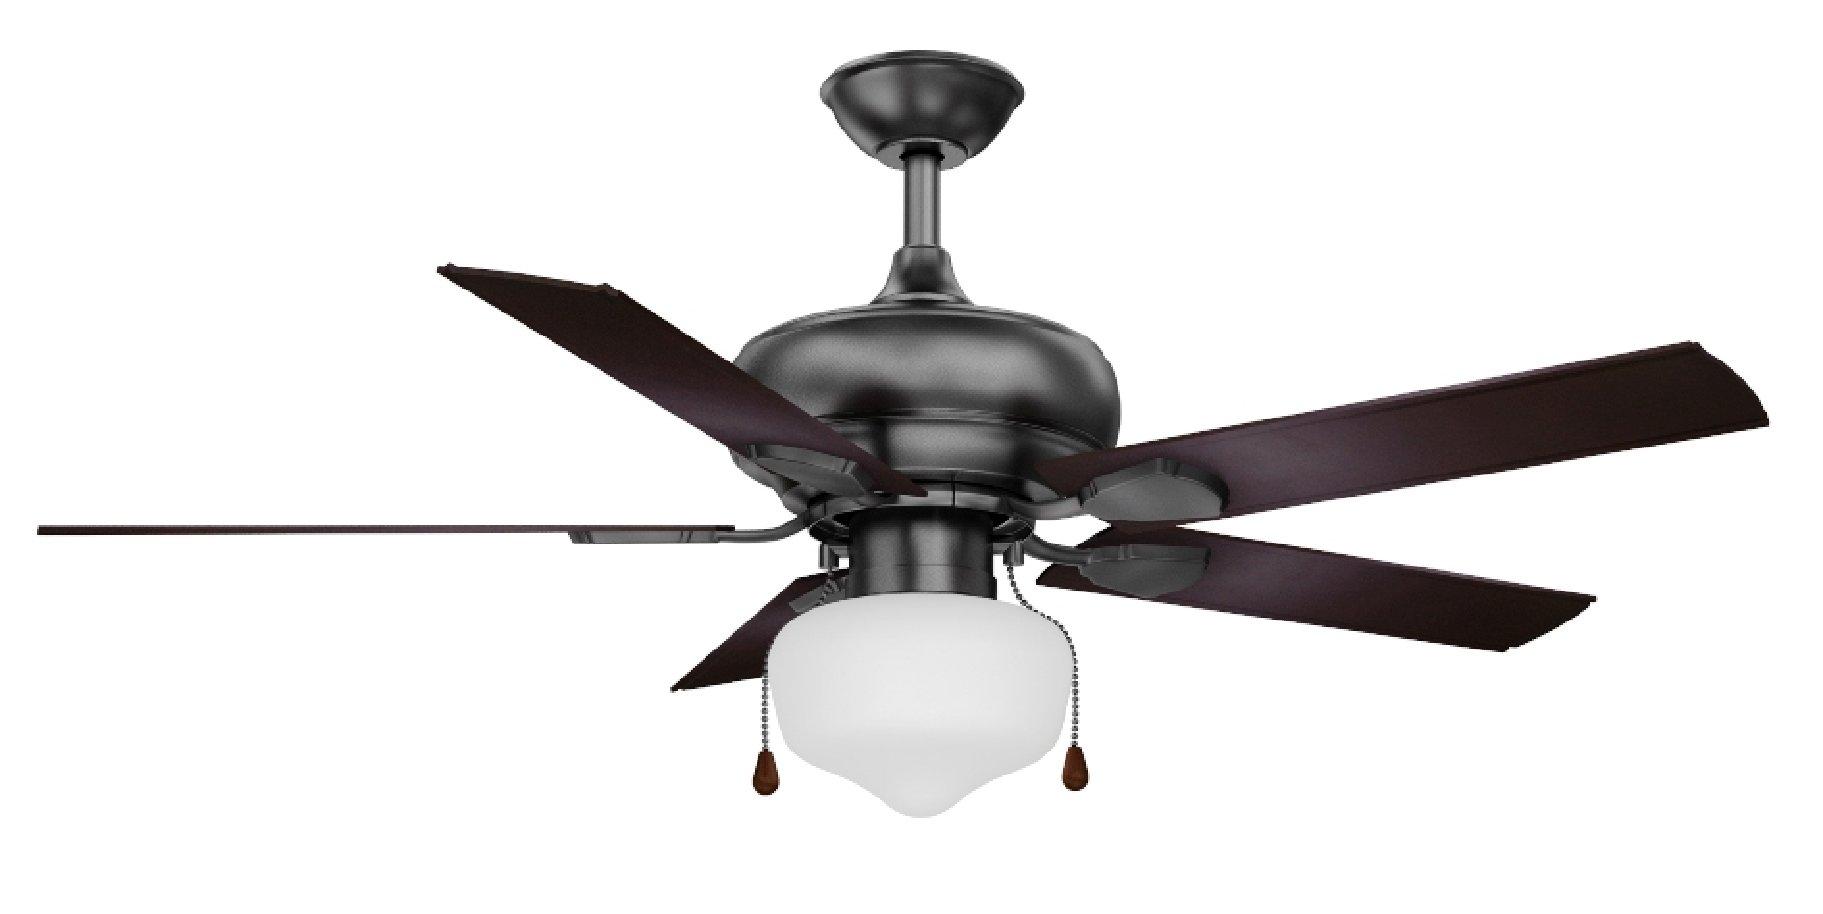 CANARM LTD. OUTLAND 52-Inch, 5 Blade Ceiling Fan, 1 Bulb Fan Light, Black, damp location rated